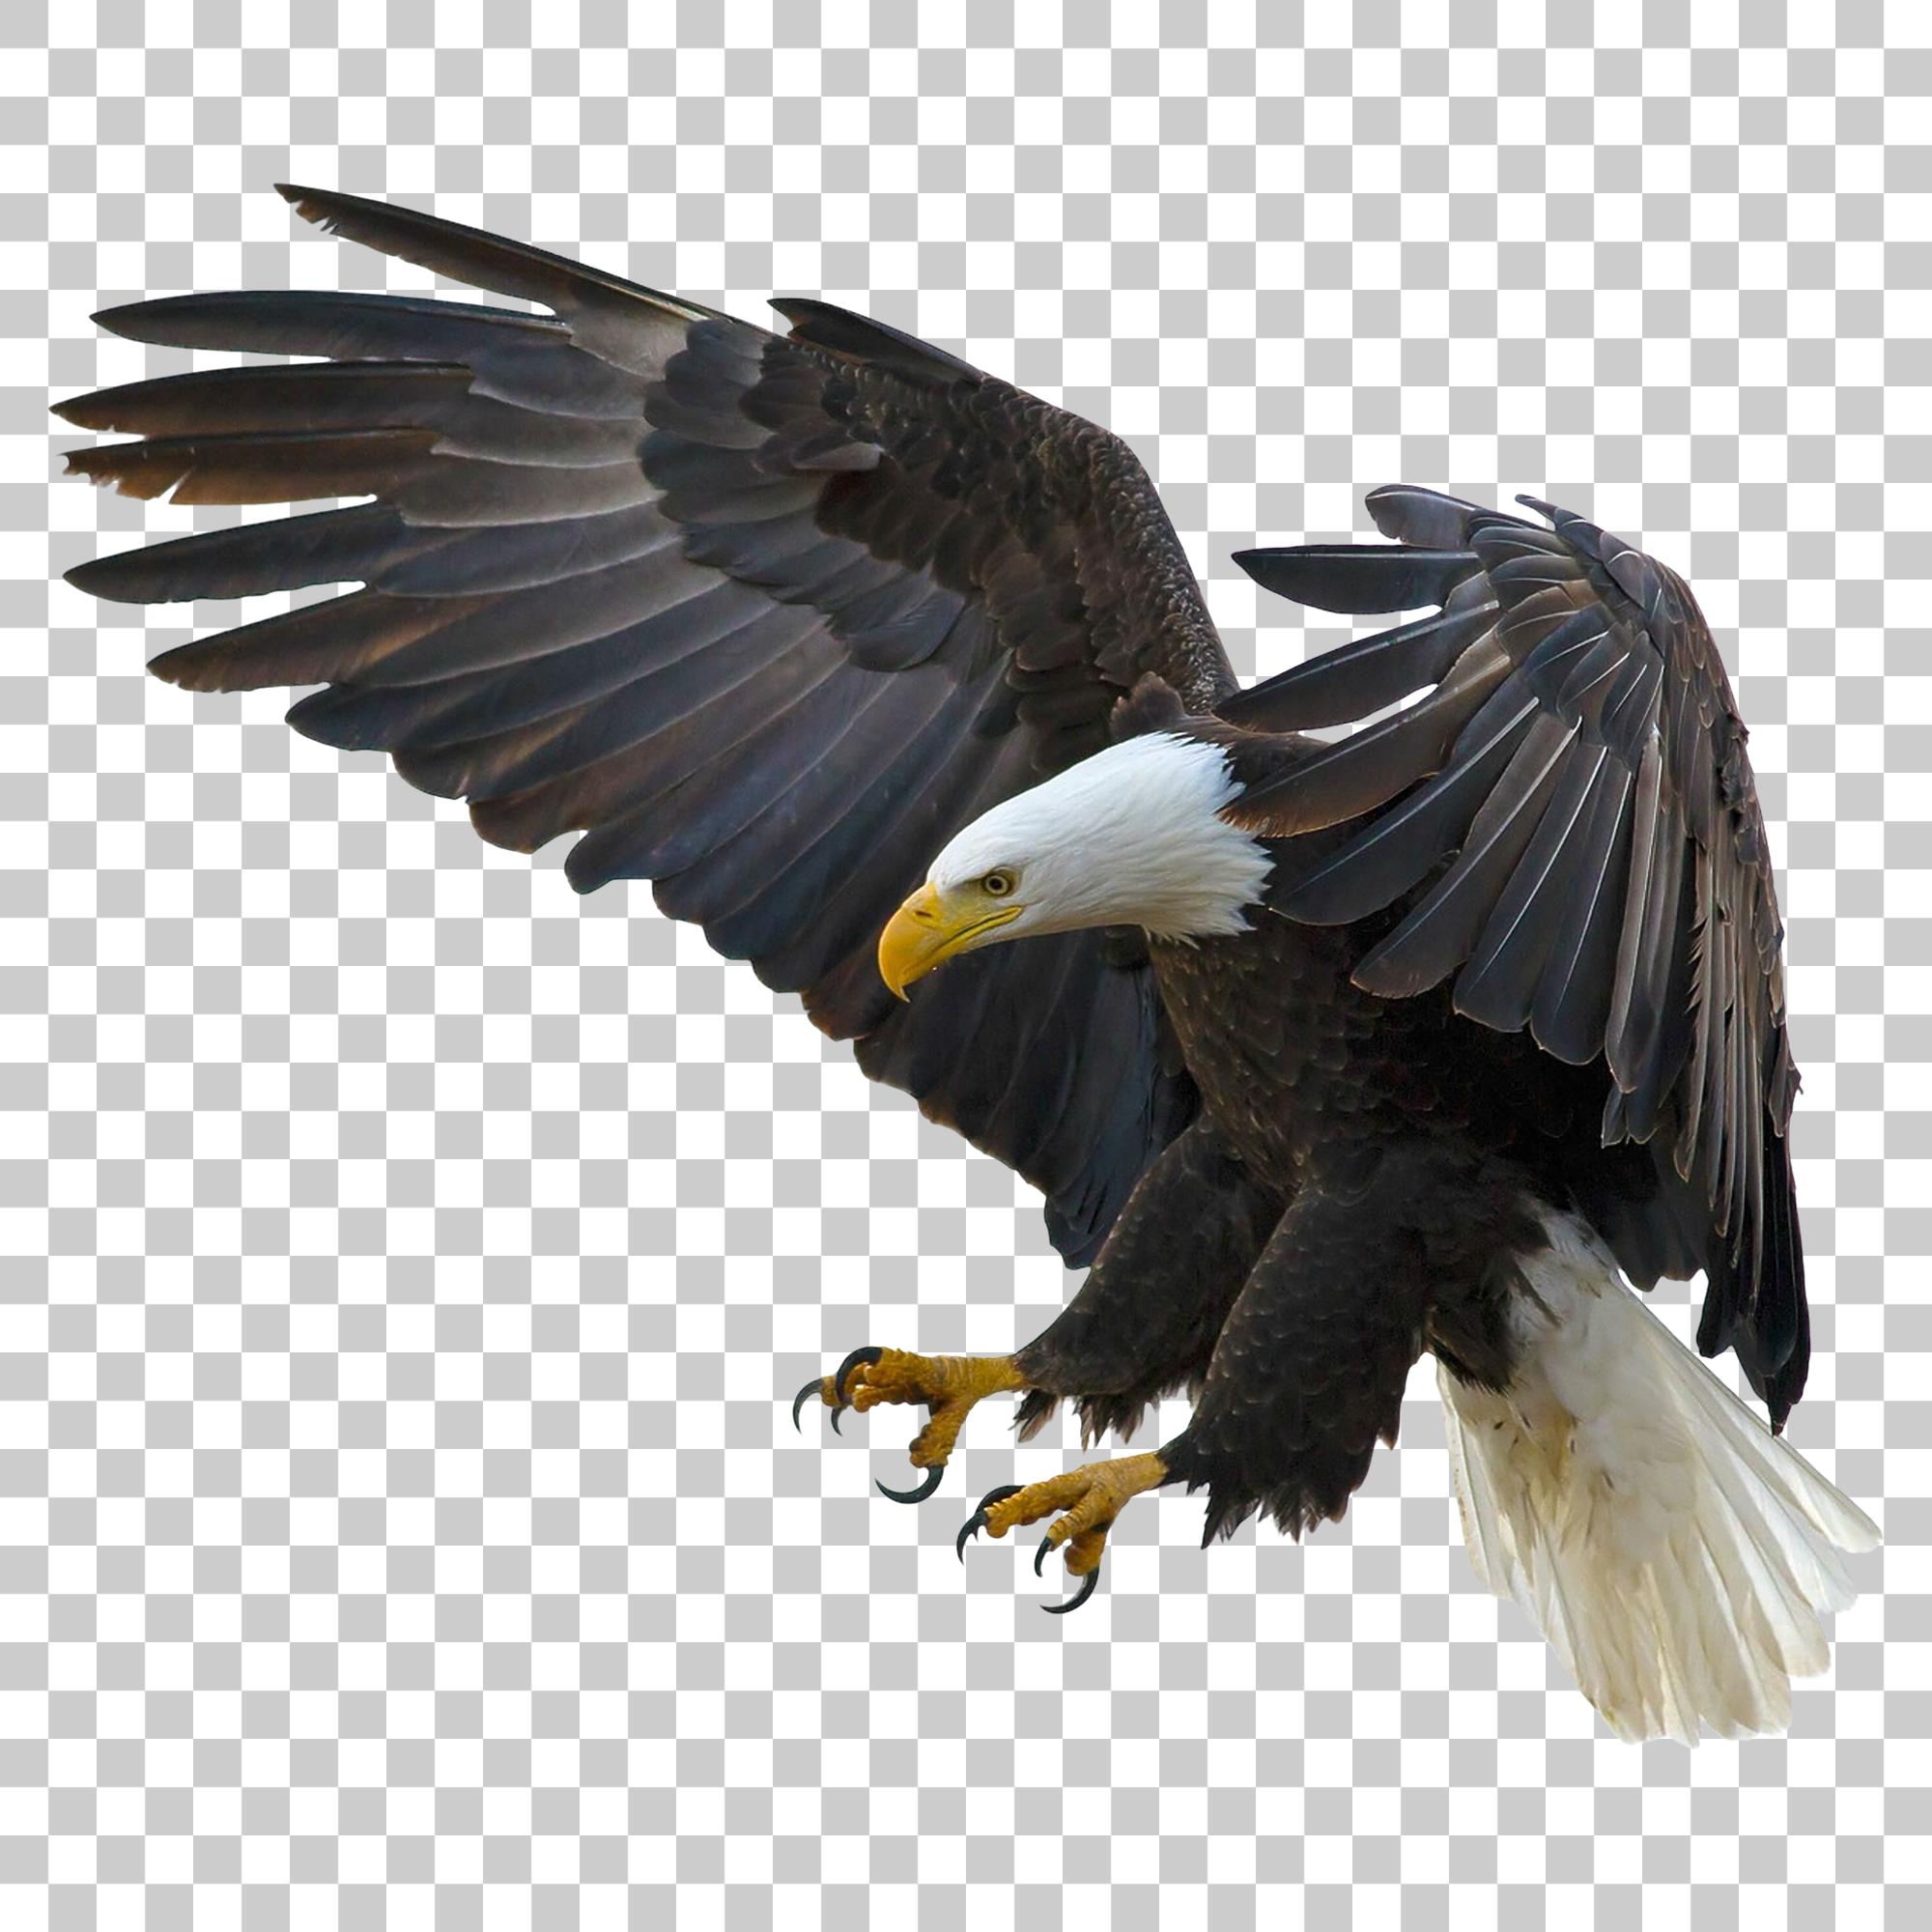 Eagle Hawk Bird Png Image With Transparent Background Blur Image Background Black Background Images Studio Background Images